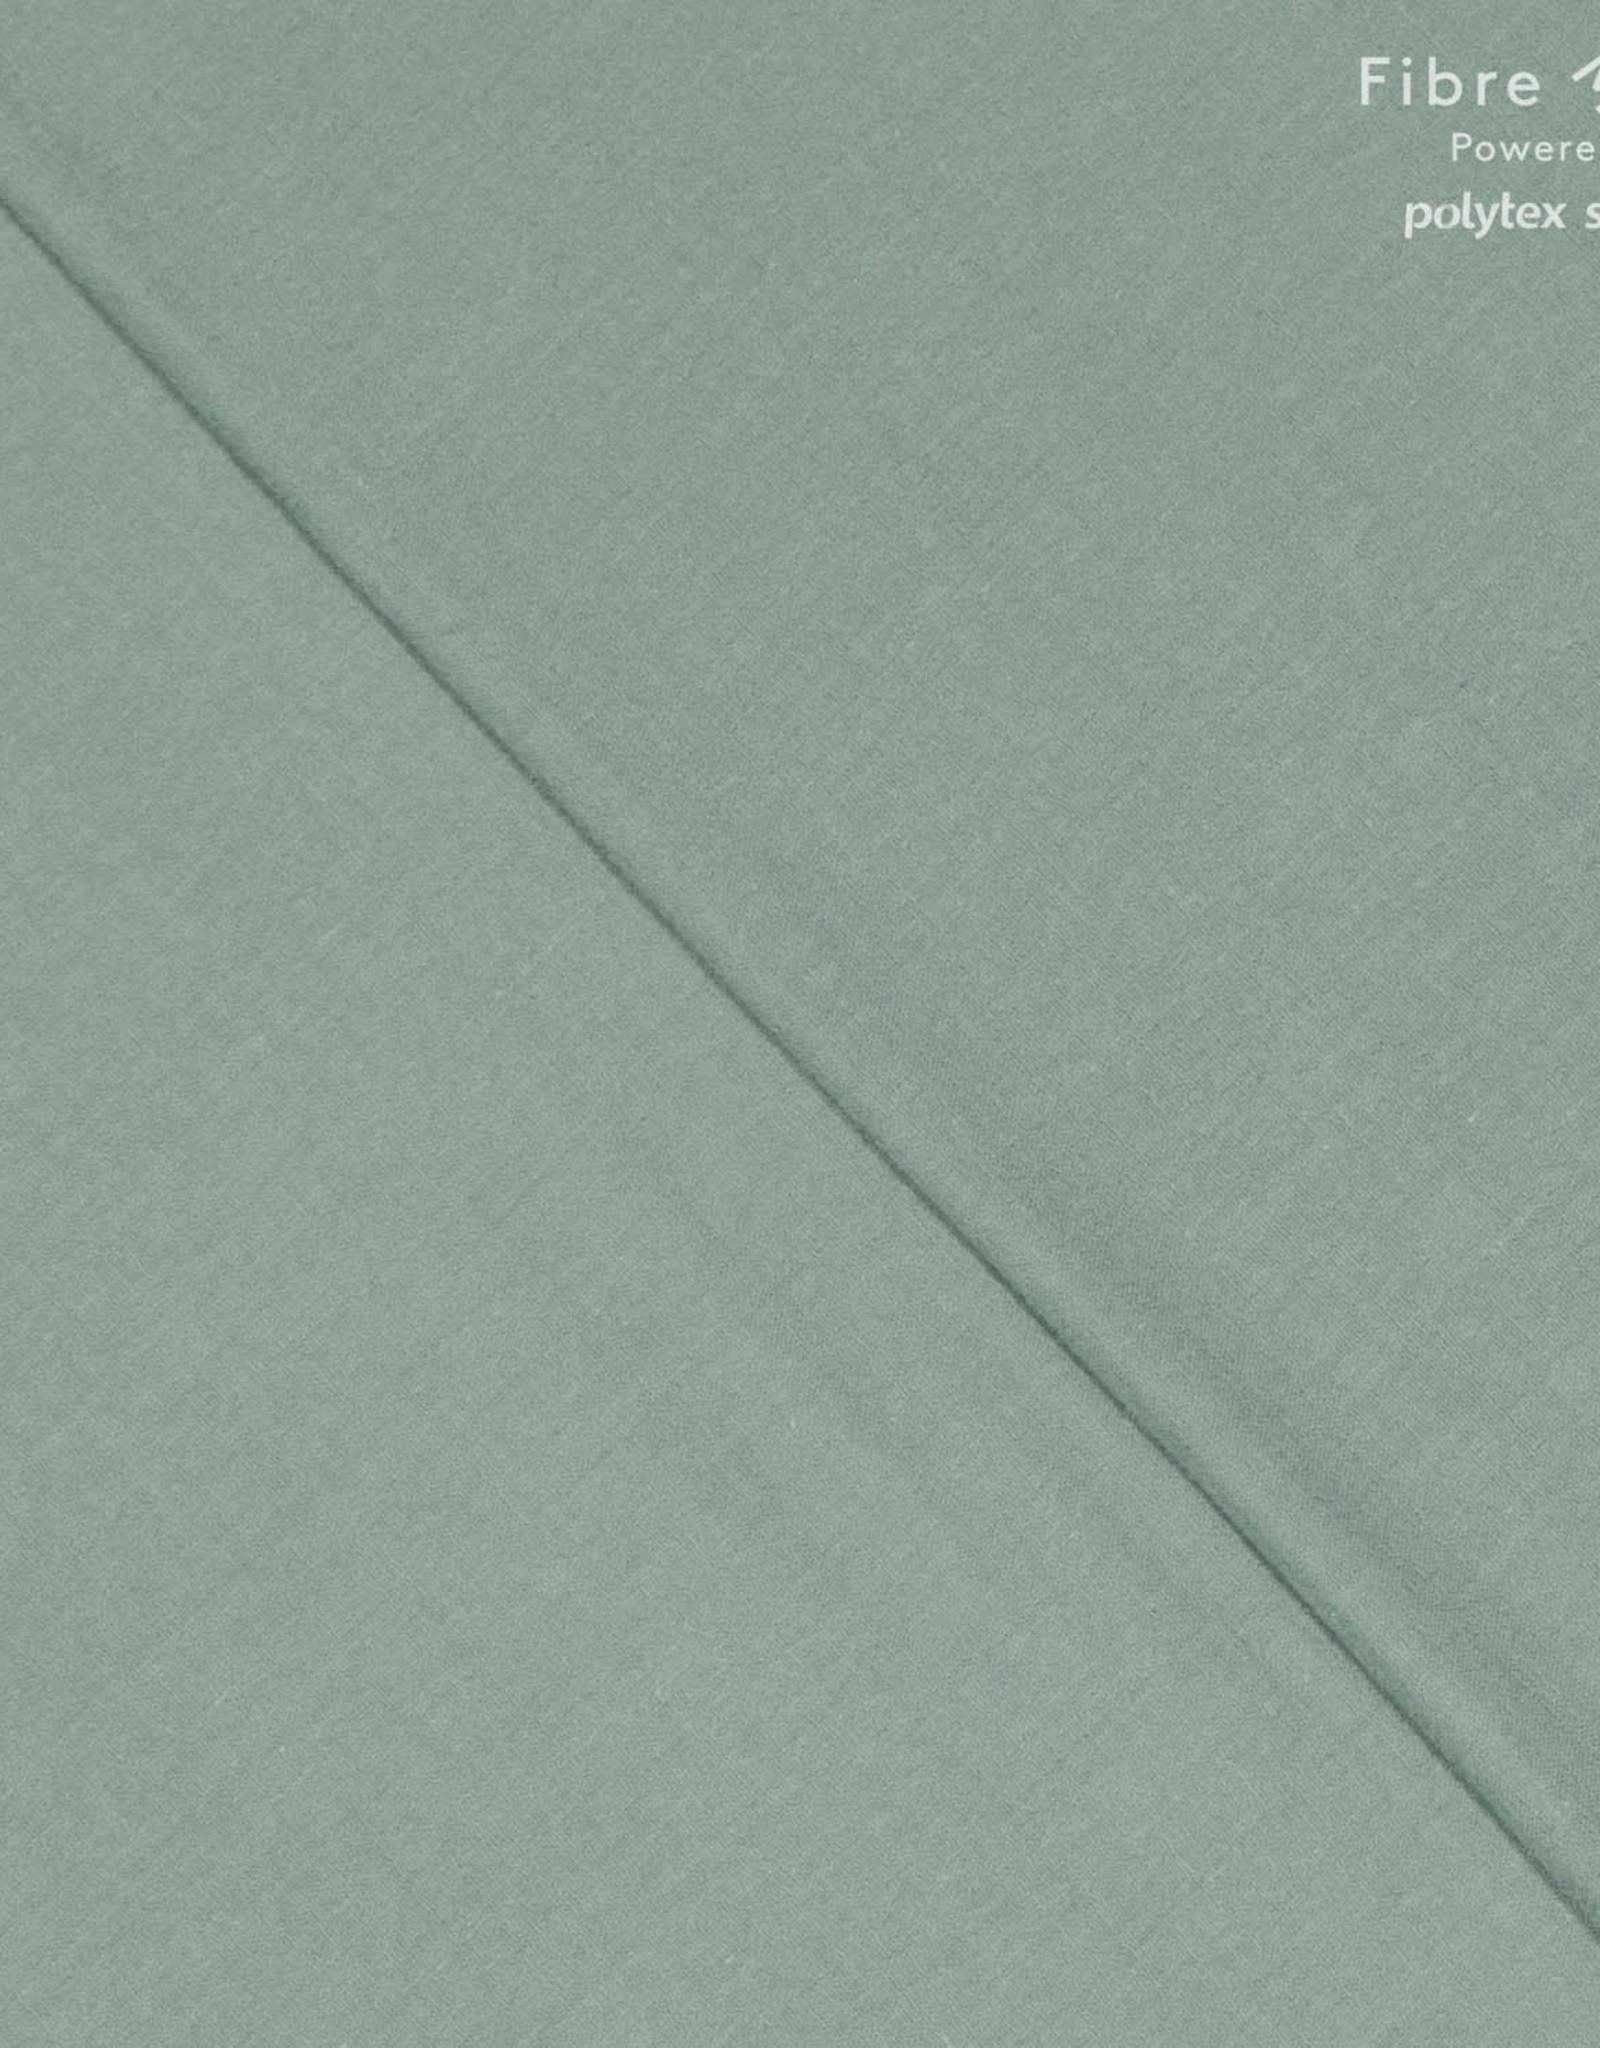 Fibre Mood Fibre Mood editie 15 Hydrofiel Uni subtiel groen (Lou)